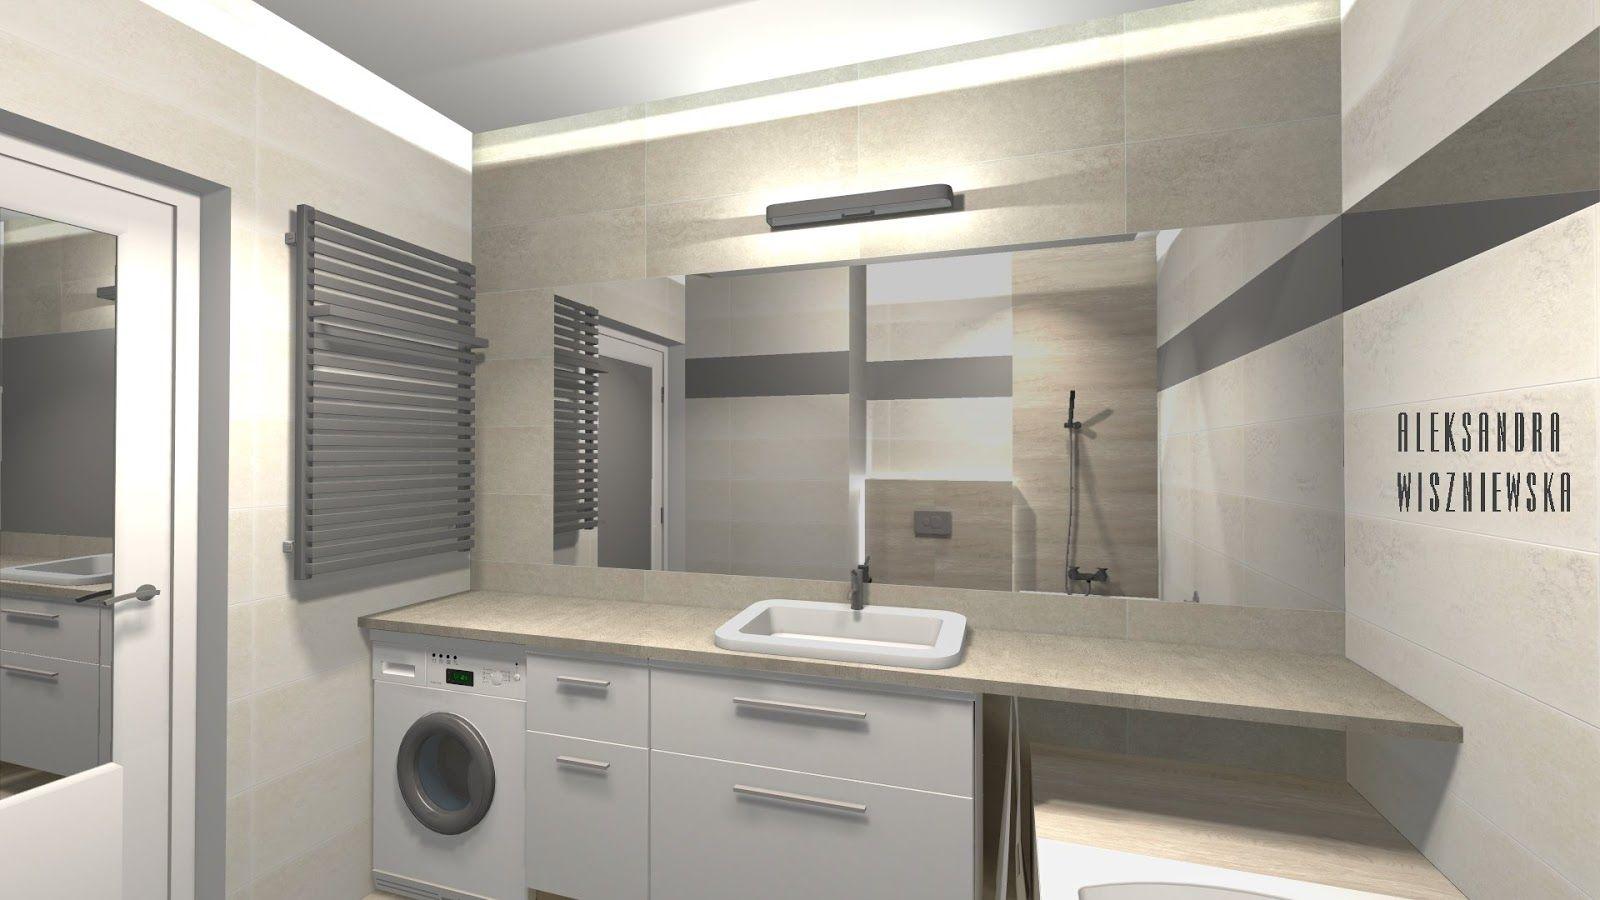 Projekty łazienek Wizualizacje Paradyż Meltemimelte By My